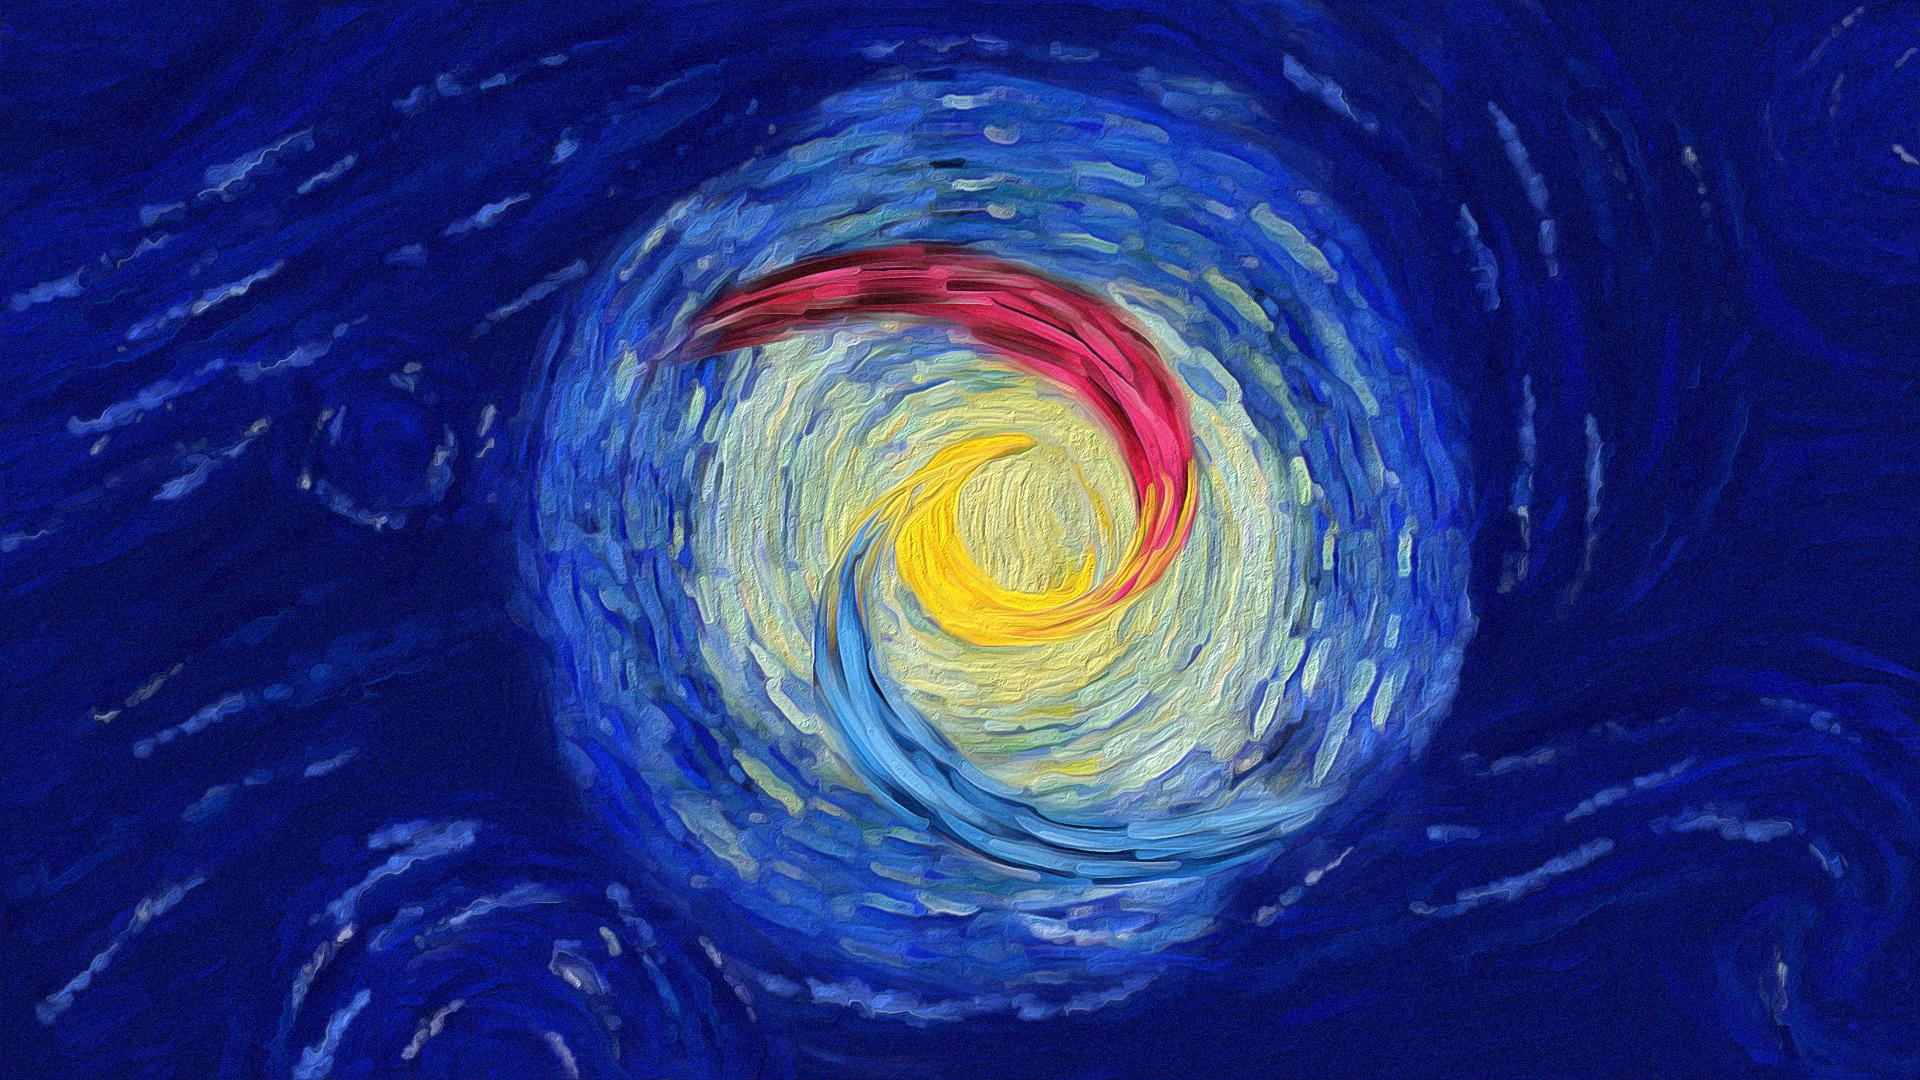 Van_Gogh_02 copy.jpg